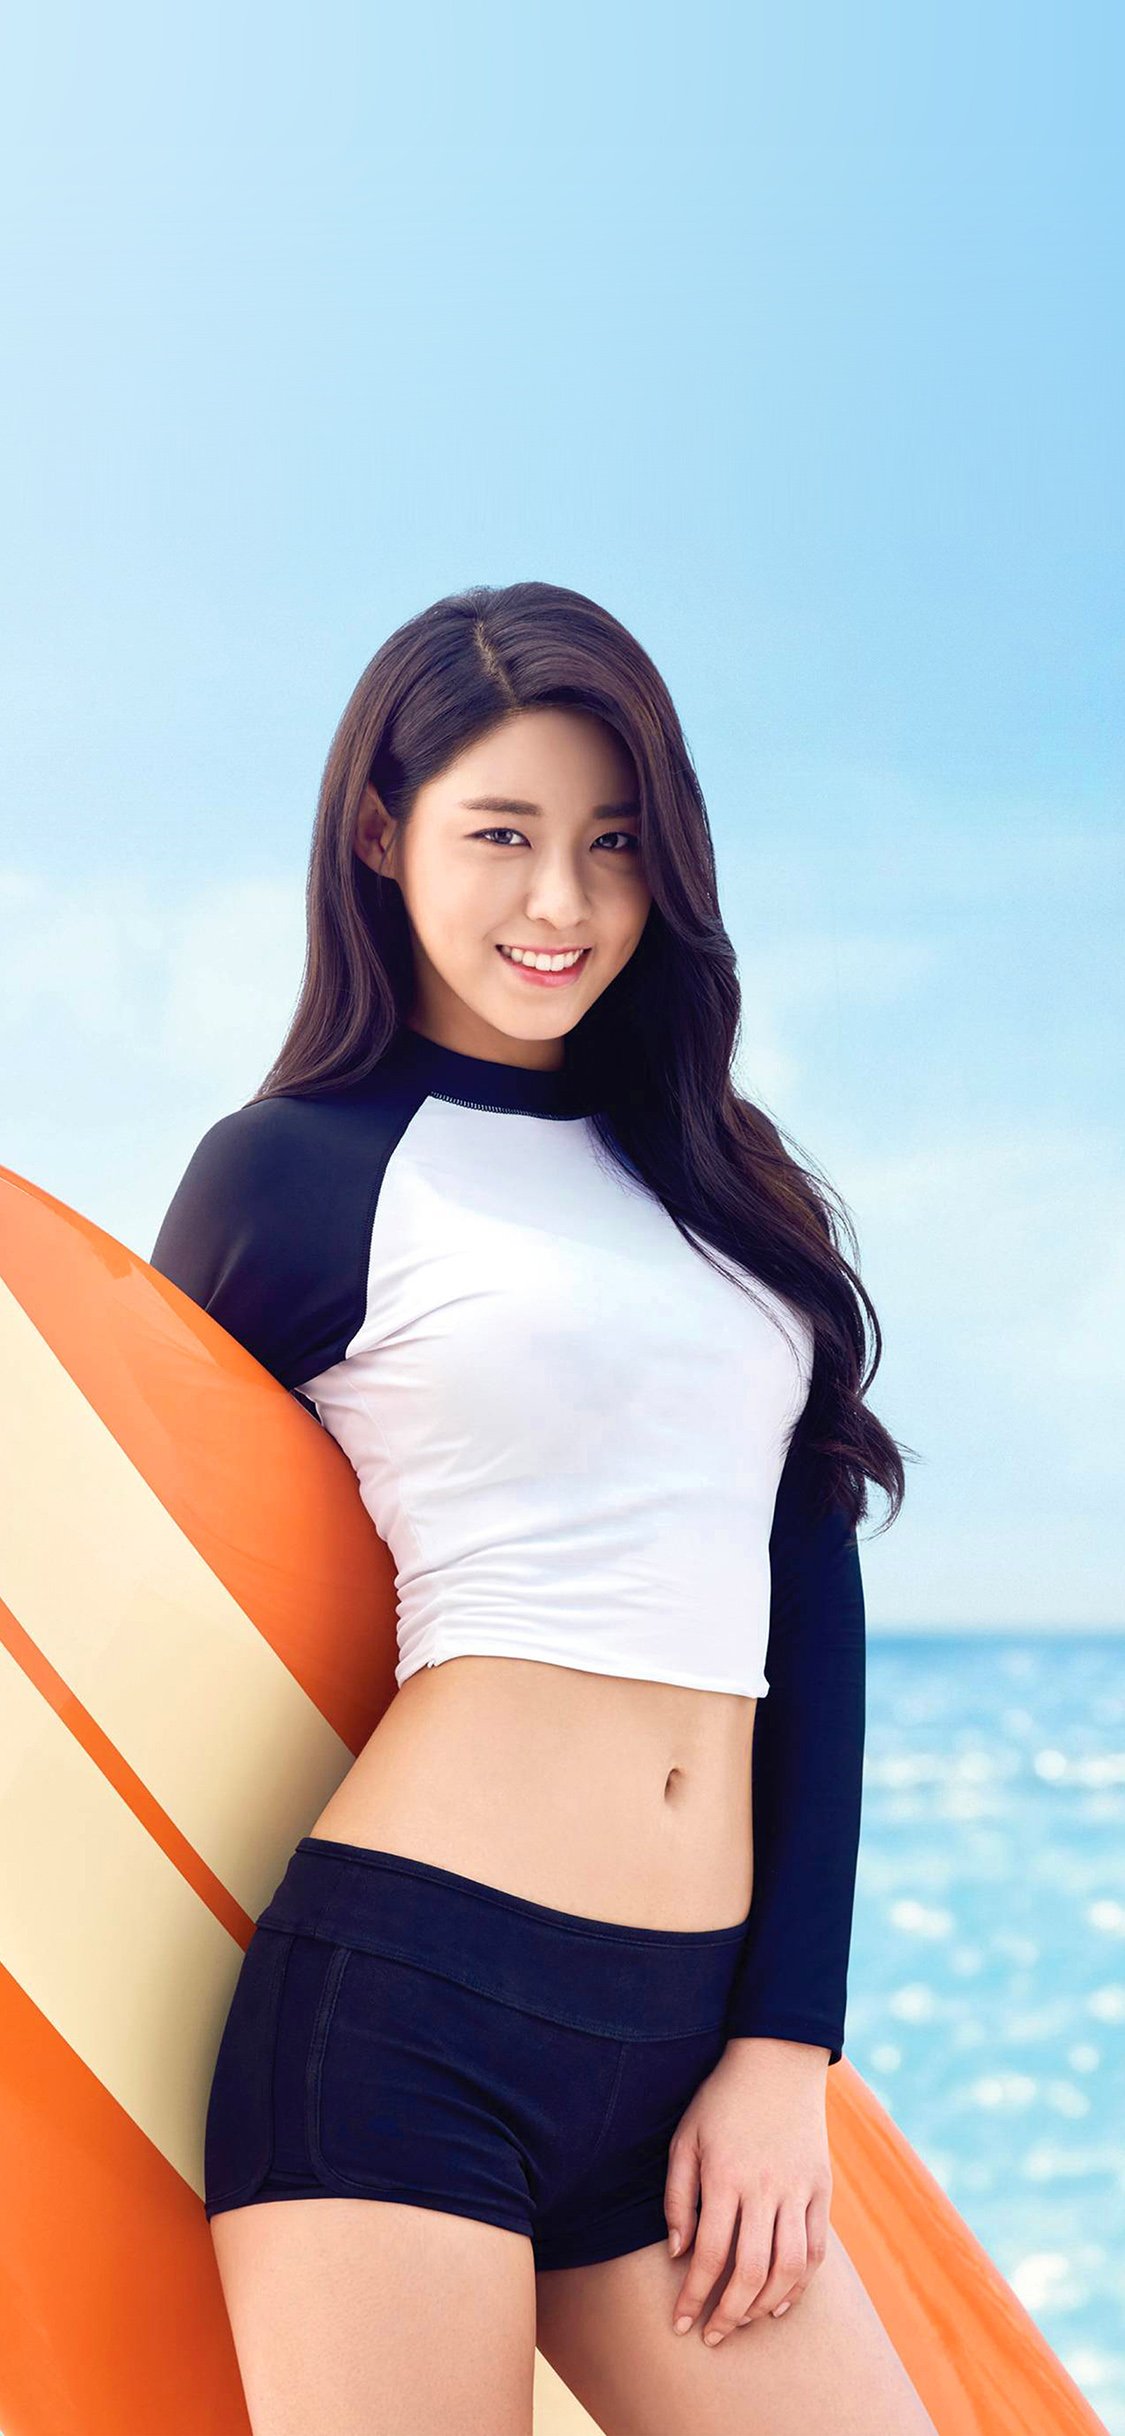 hh34-seolhyun-aoa-kpop-sea-sumner-cute-swimsuit - Papers.co